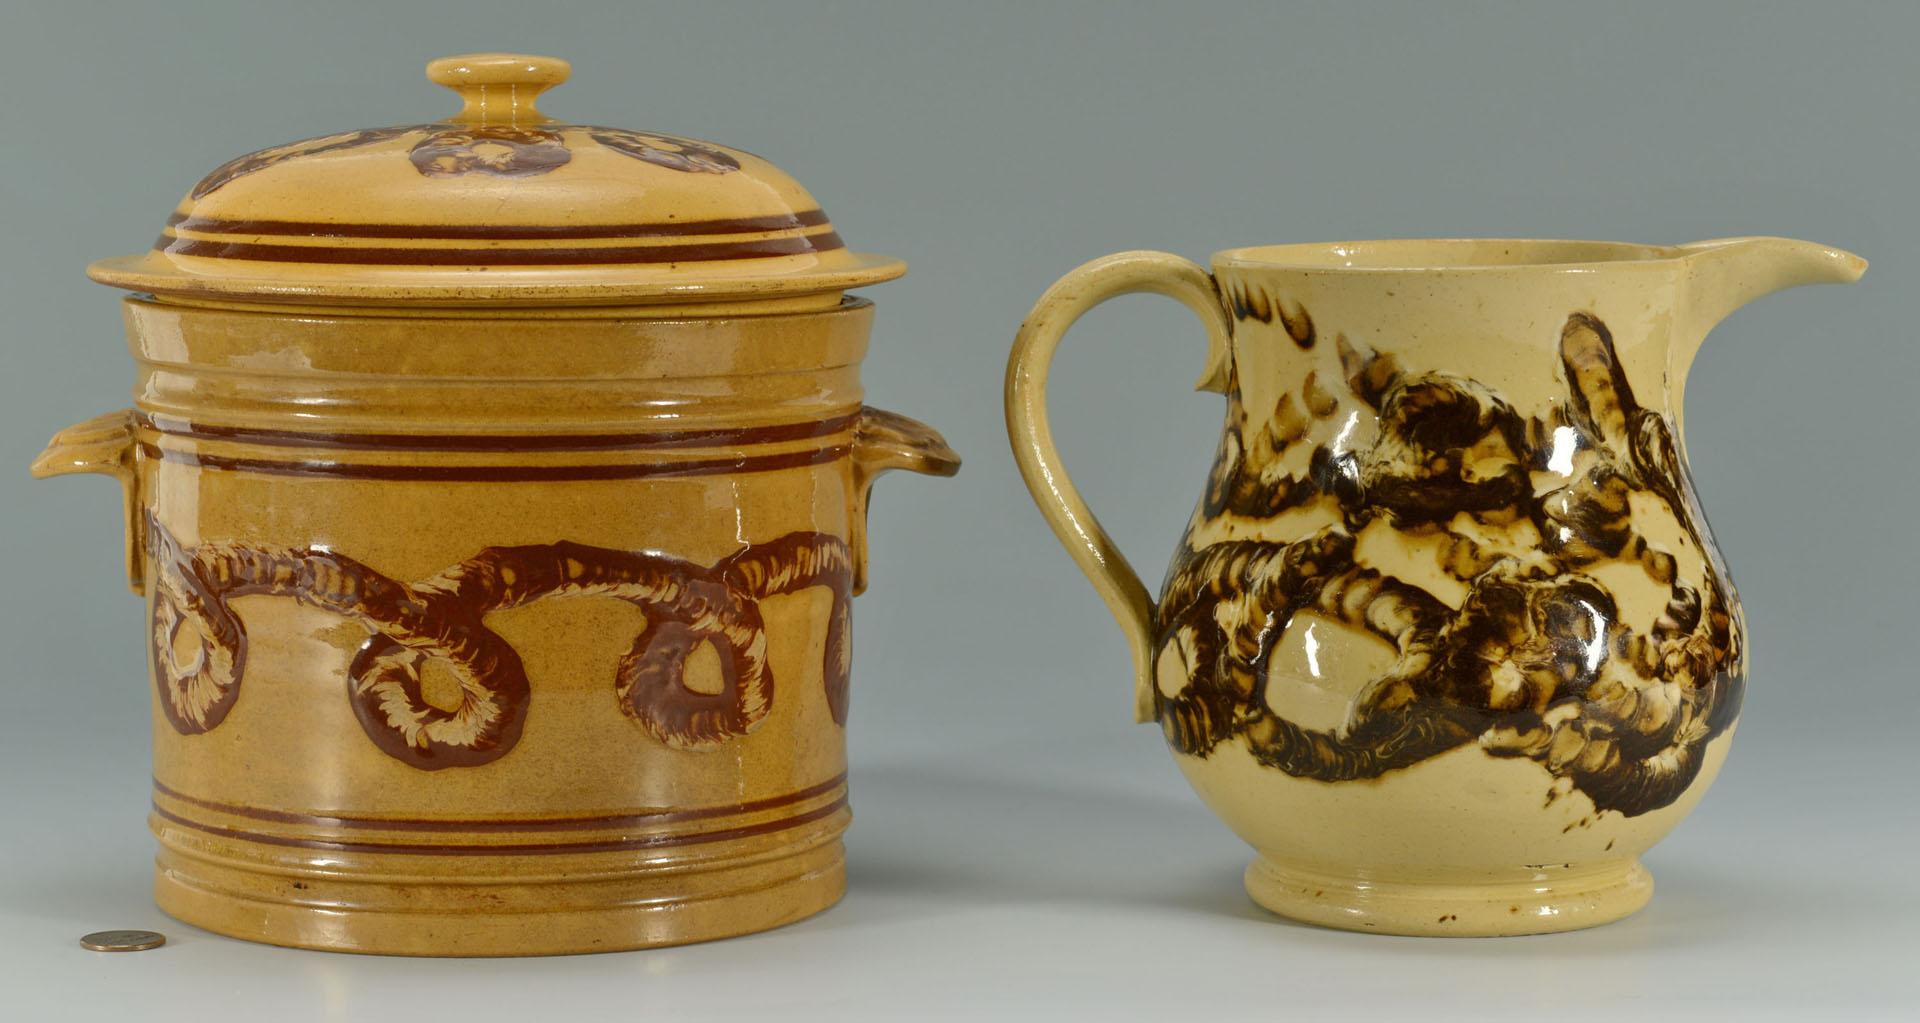 Lot 144: Yellowware Mocha Earthworm jar and pitcher